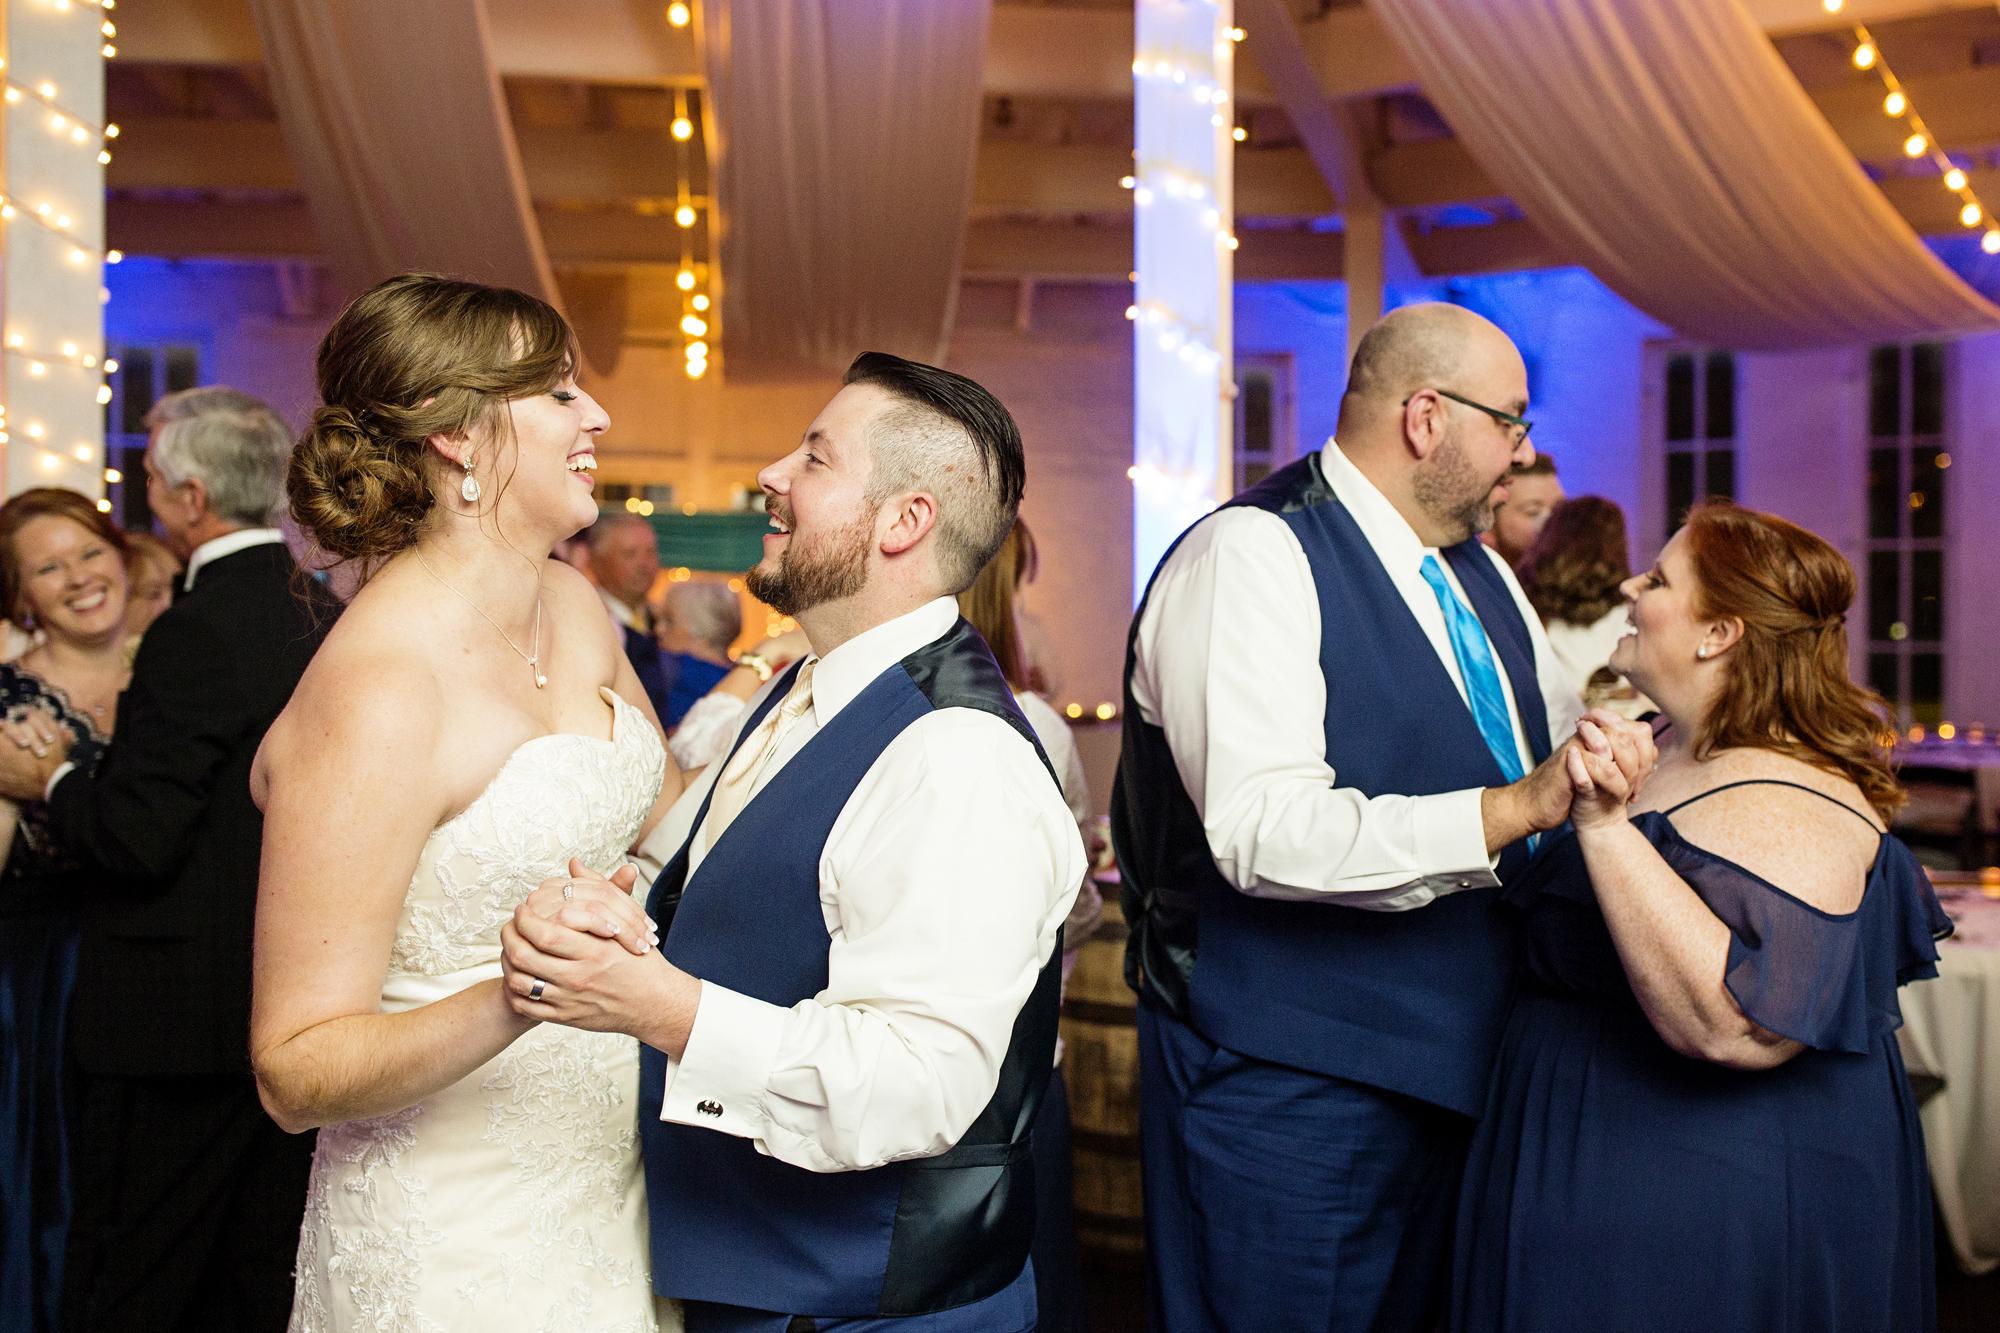 Seriously_Sabrina_Photography_Lexington_Kentucky_21c_Round_Barn_Red_Mile_Wedding_Gorley_132.jpg